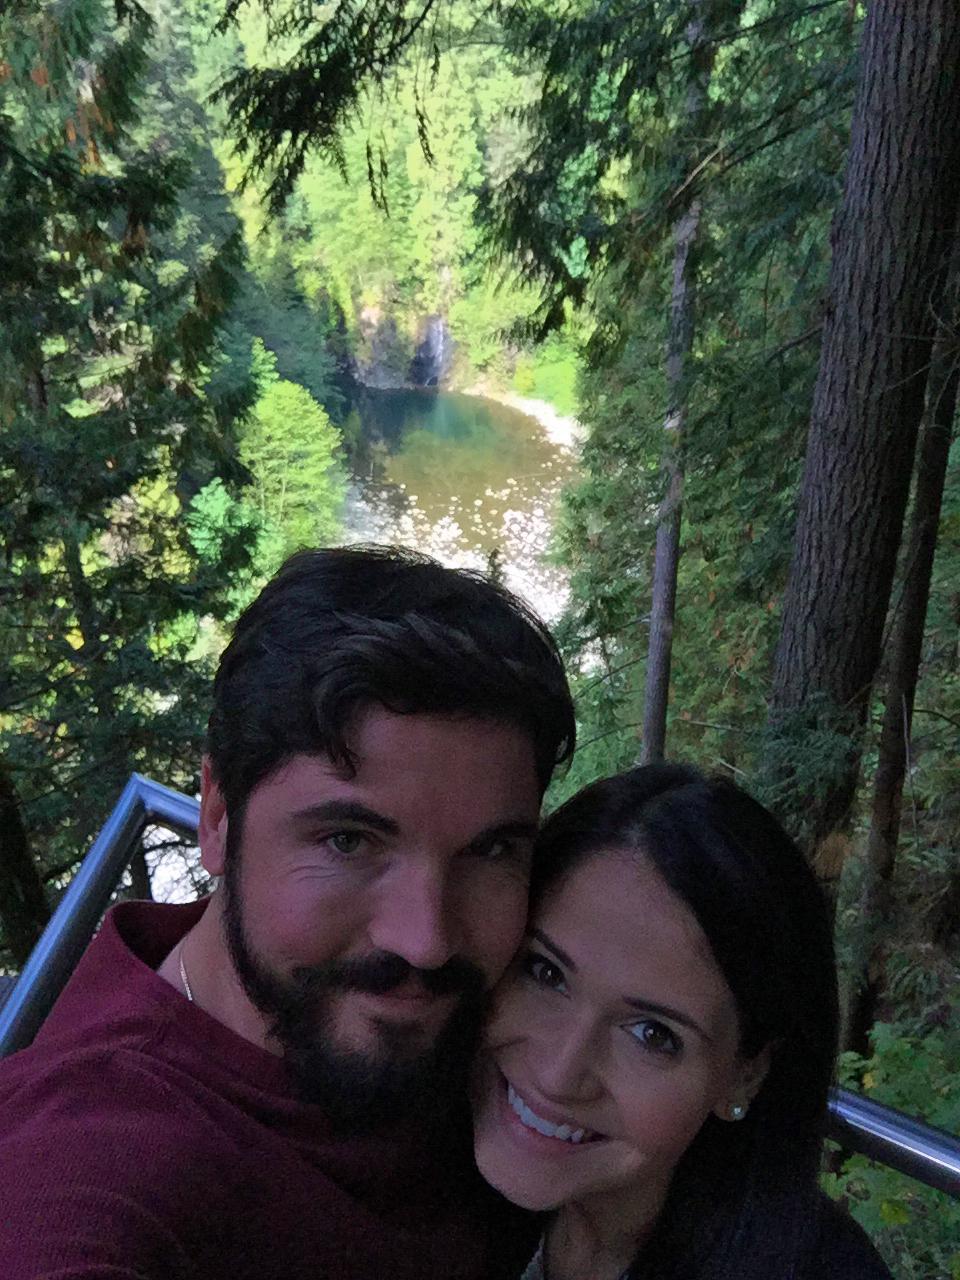 Hannah Barton - Monarch Homes Vancouver, Mt. Rainier, and Seattle Vacation 06.jpg